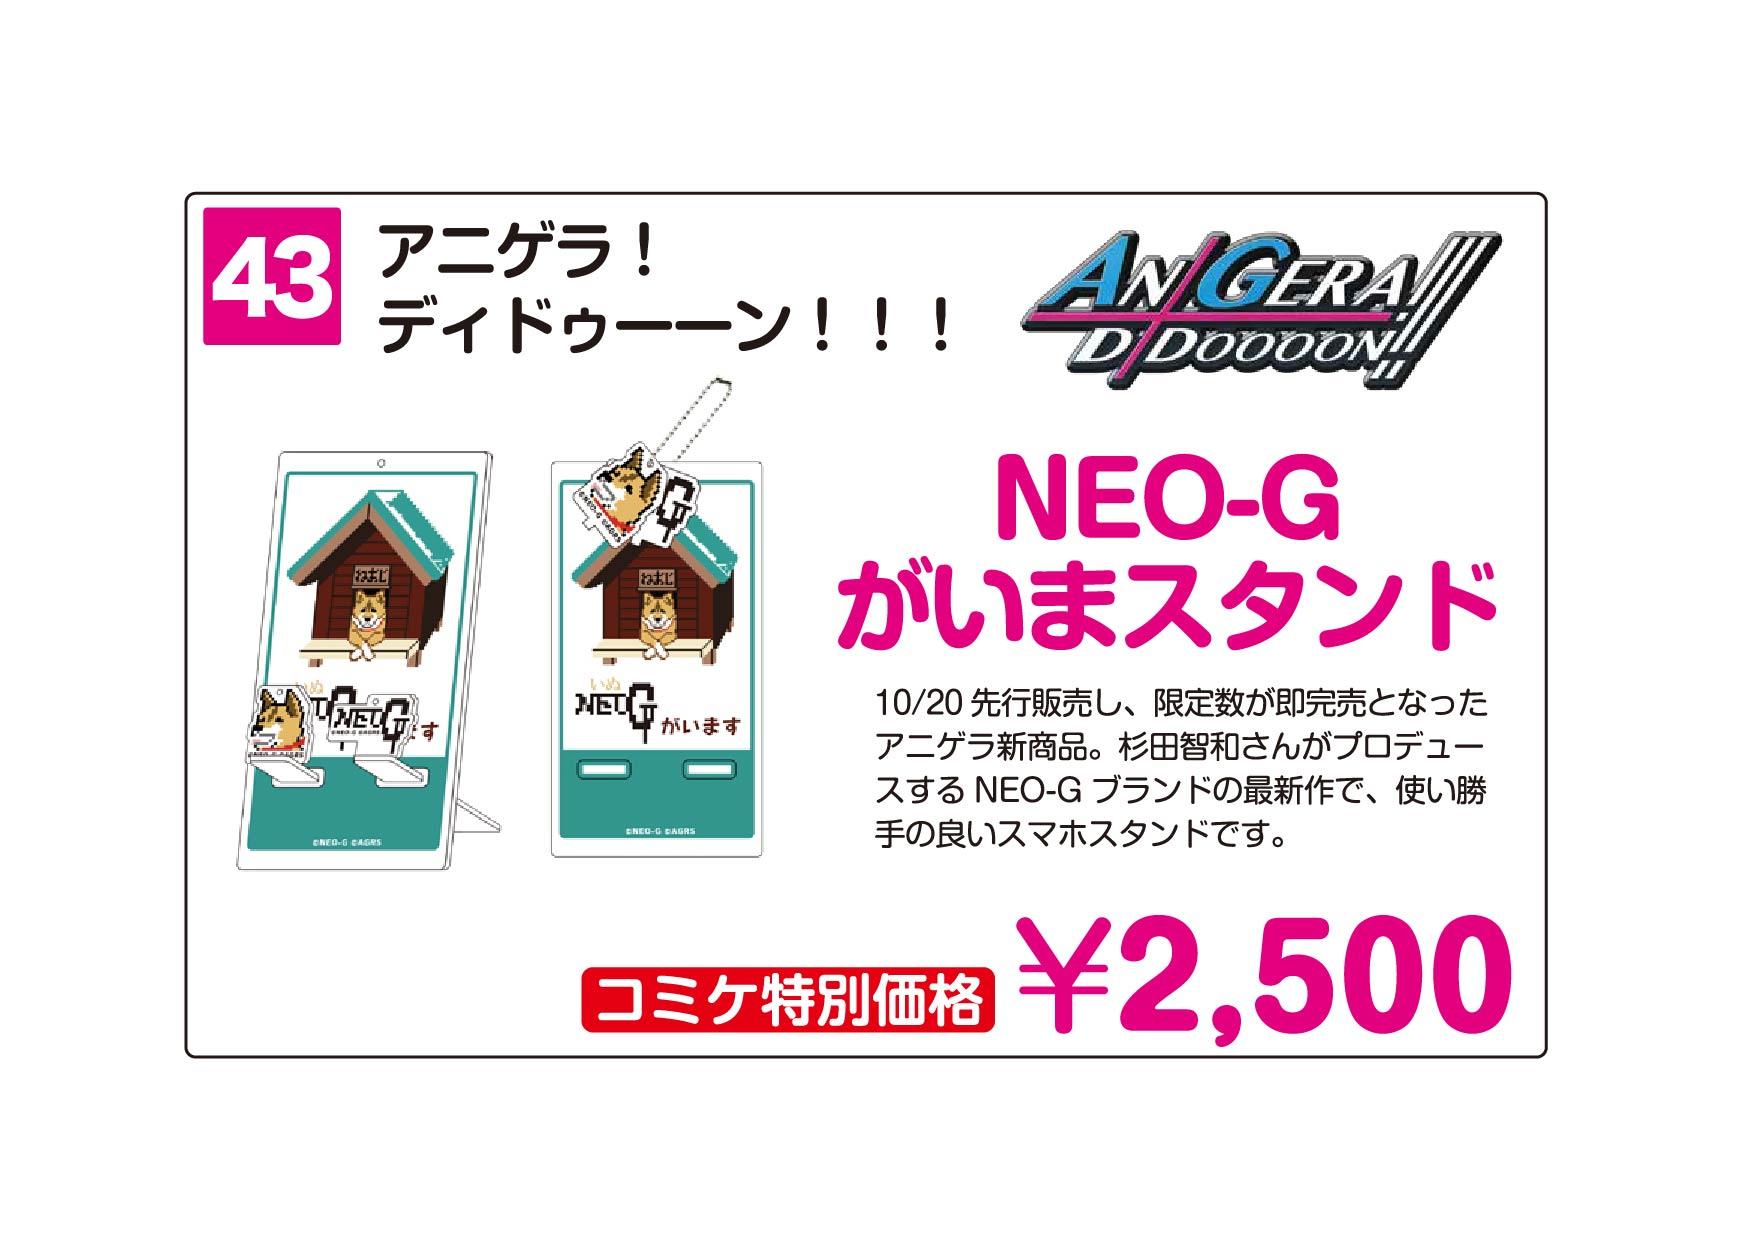 http://www.joqr.co.jp/AandG_booth/43.jpg